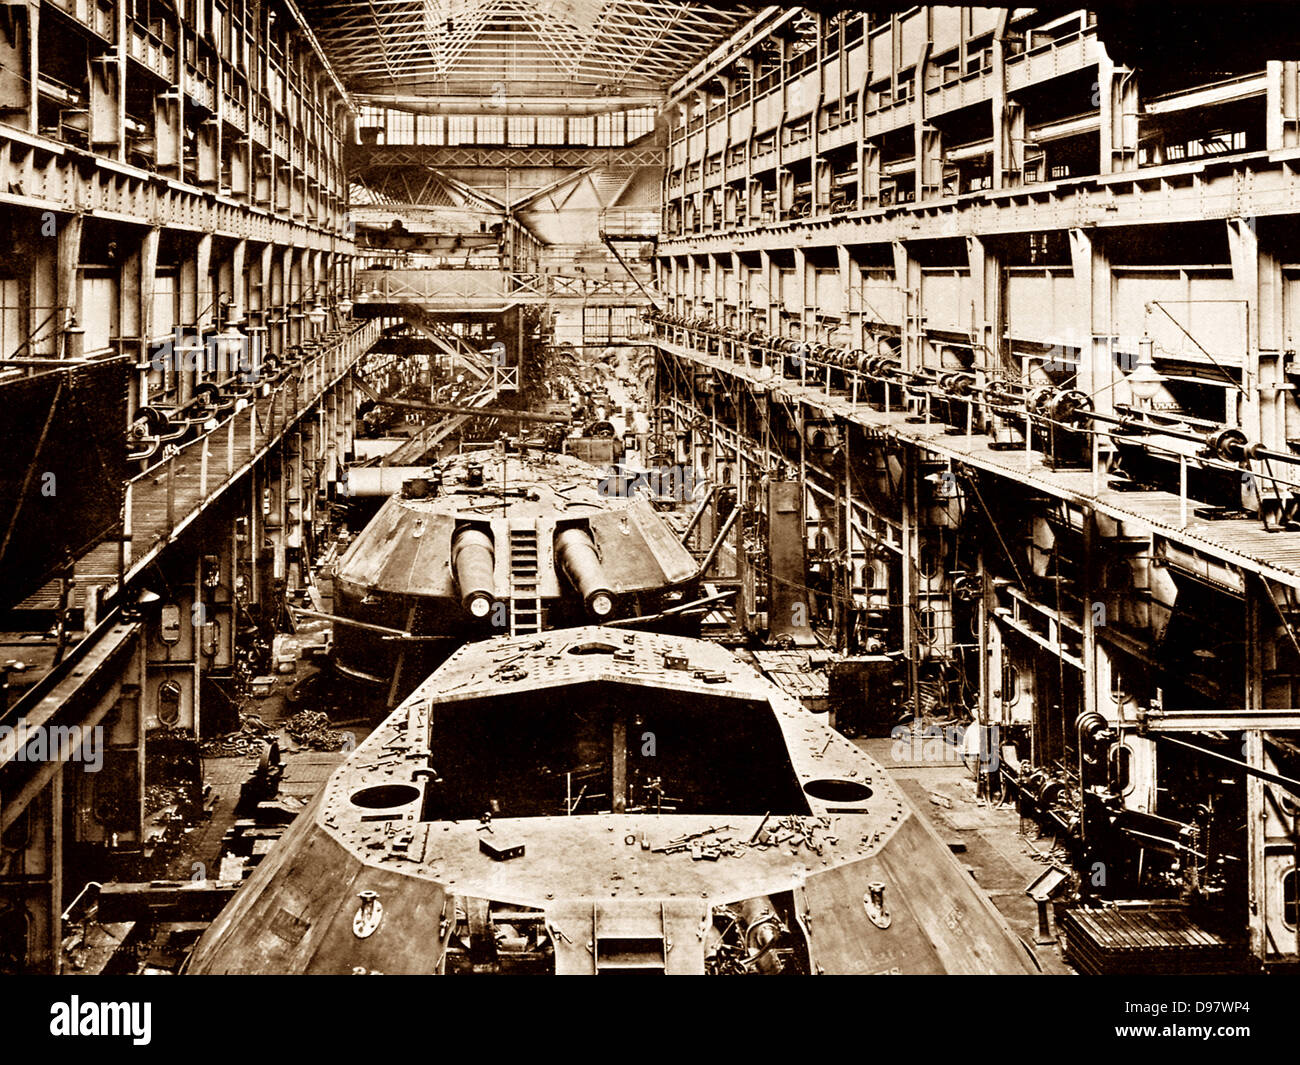 Newcastle-Upon-Tyne Elswick Works early 1900s - Stock Image